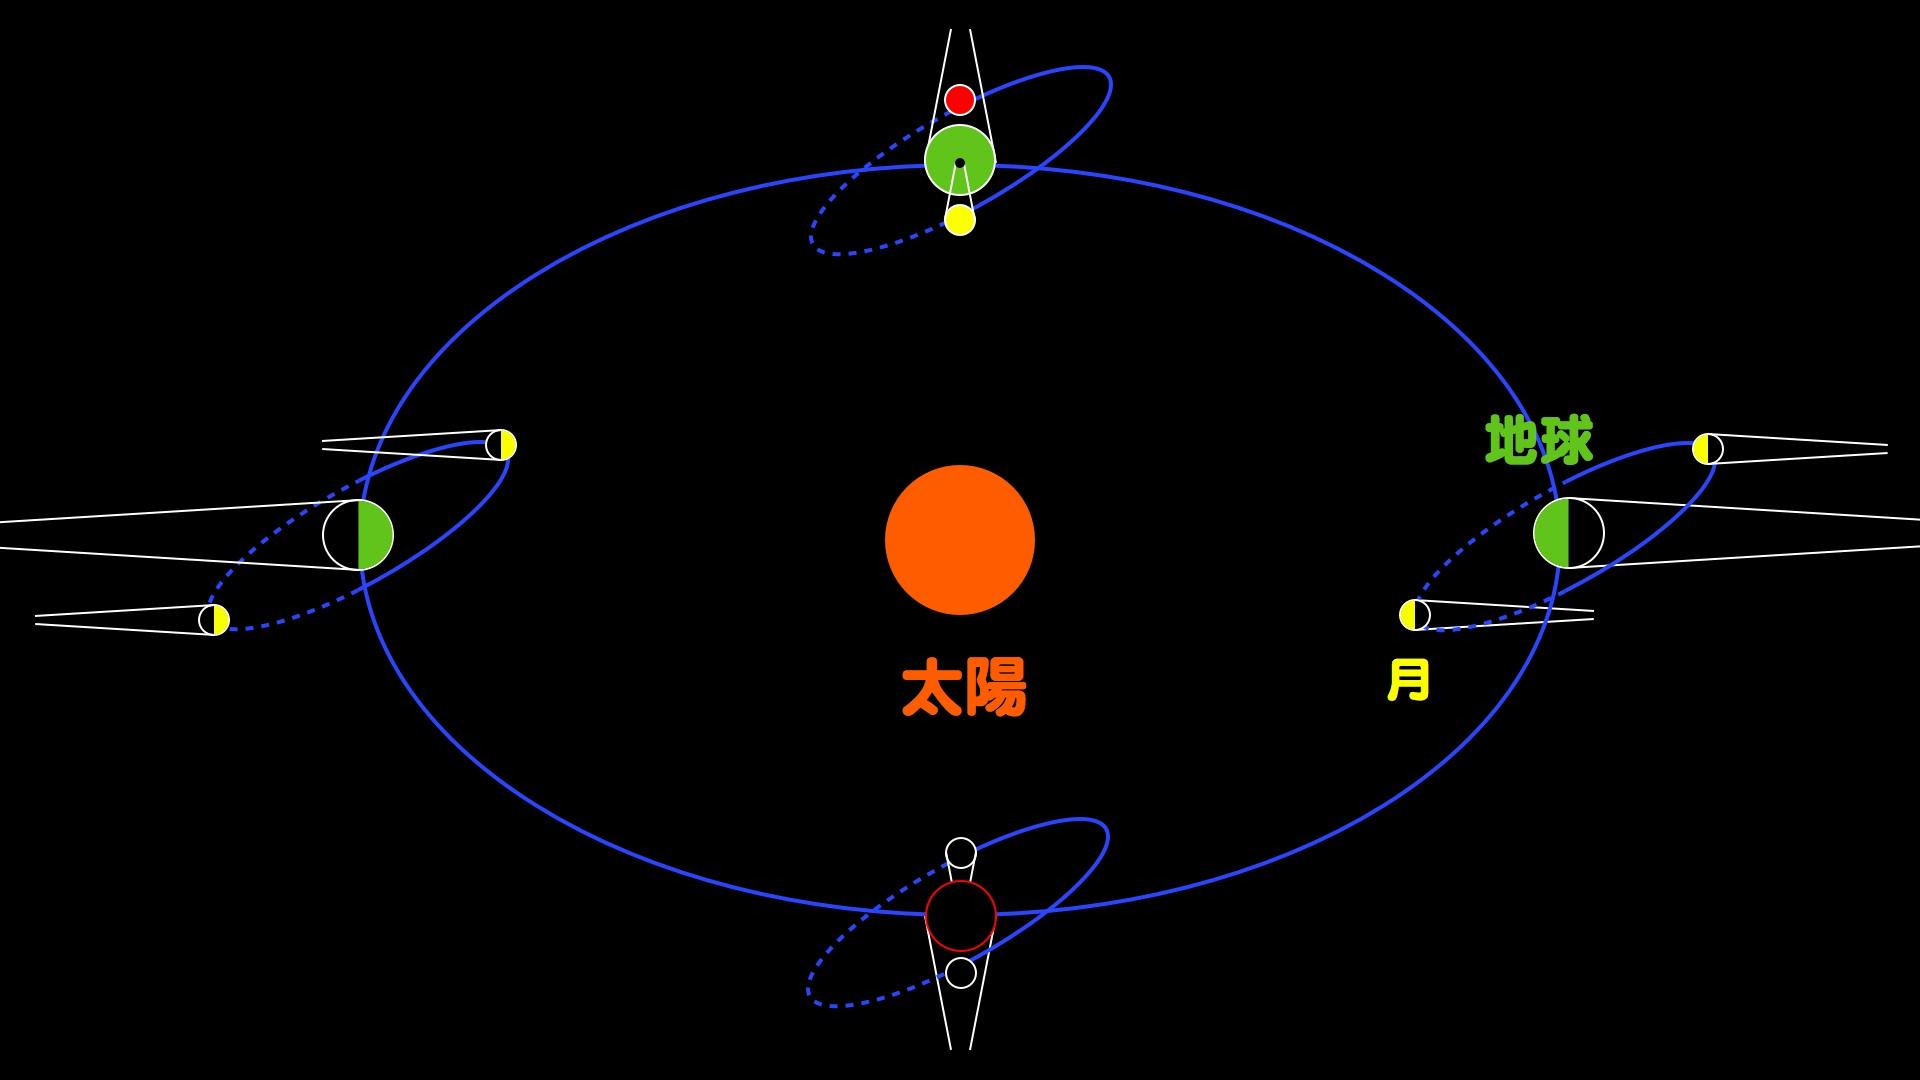 http://www.ncsm.city.nagoya.jp/study/astro/M_11-11IP.042.jpg